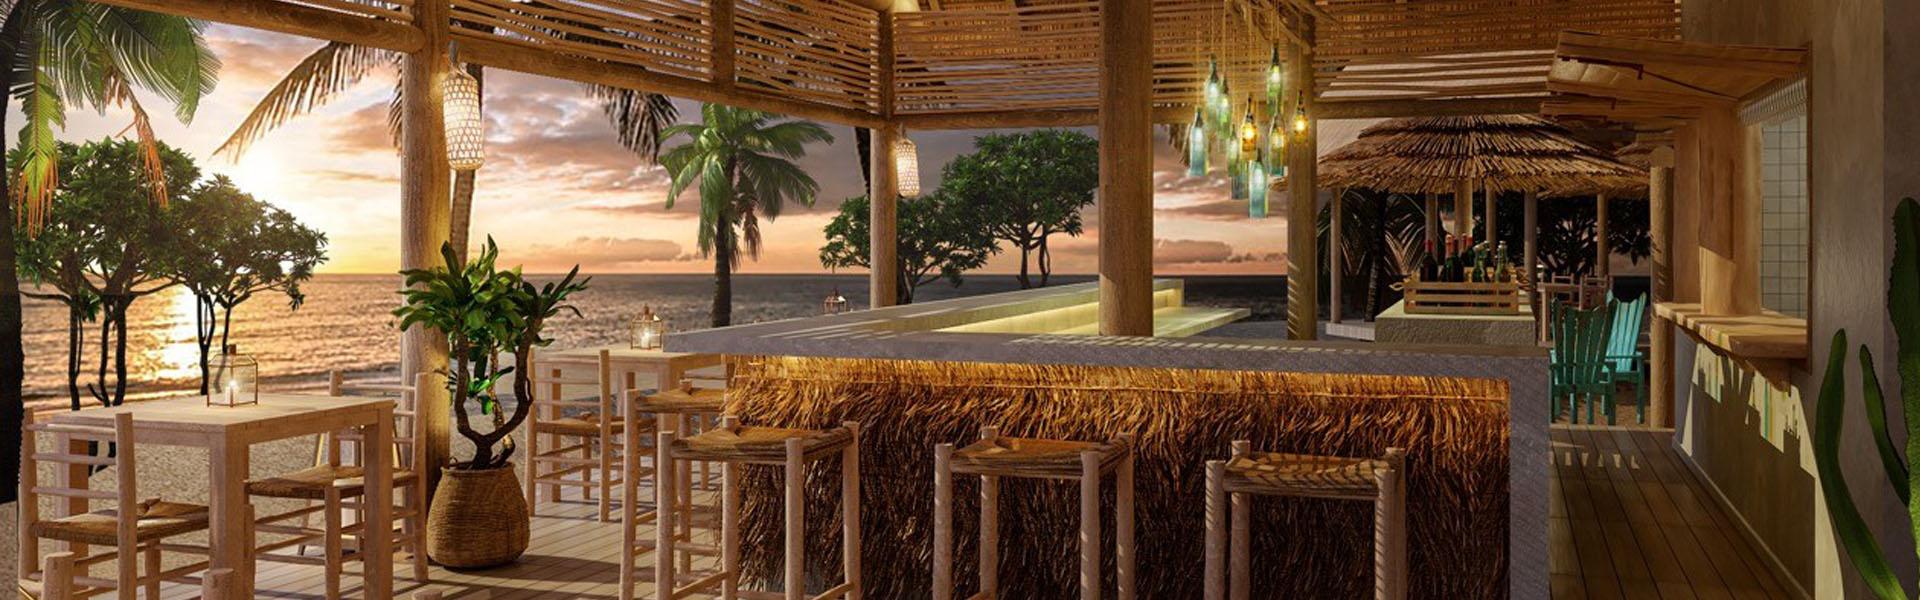 preskil_island_resort_restaurant_mauritius